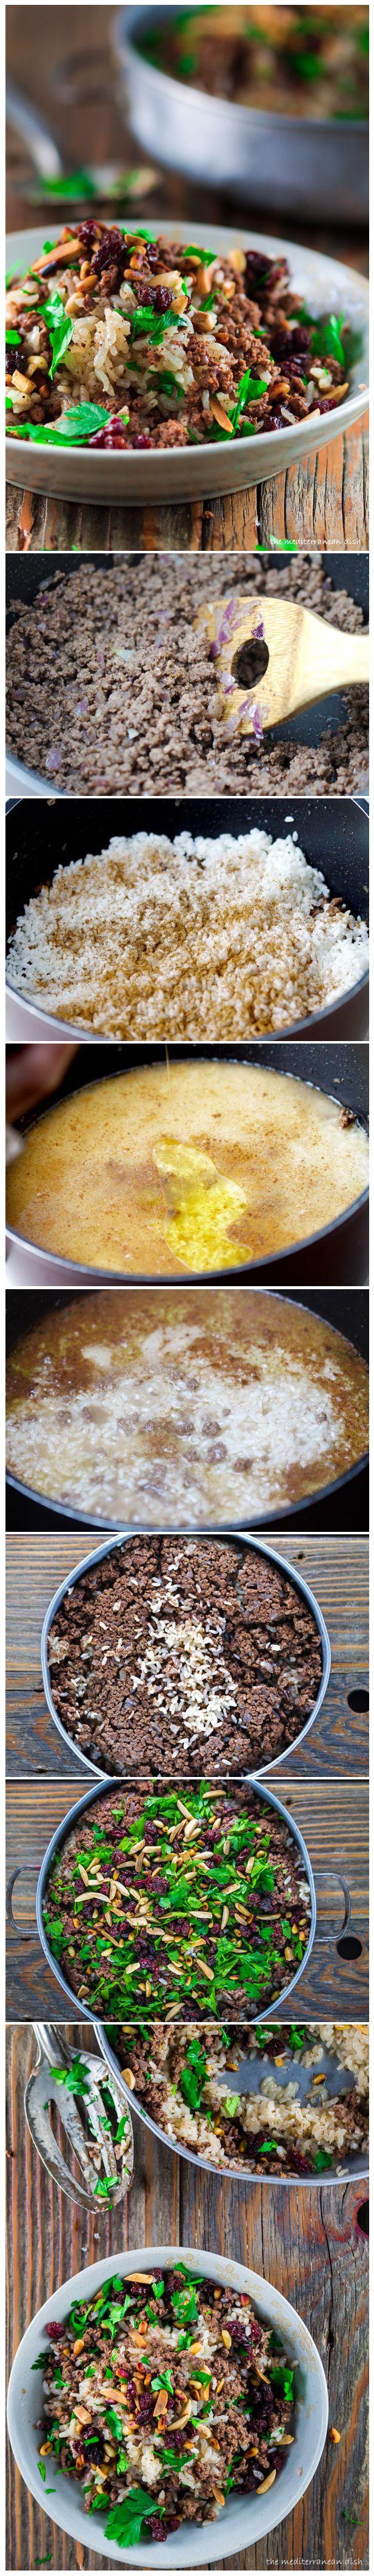 Mediterranean Hashweh Rice with Beef, Nuts, and Raisins